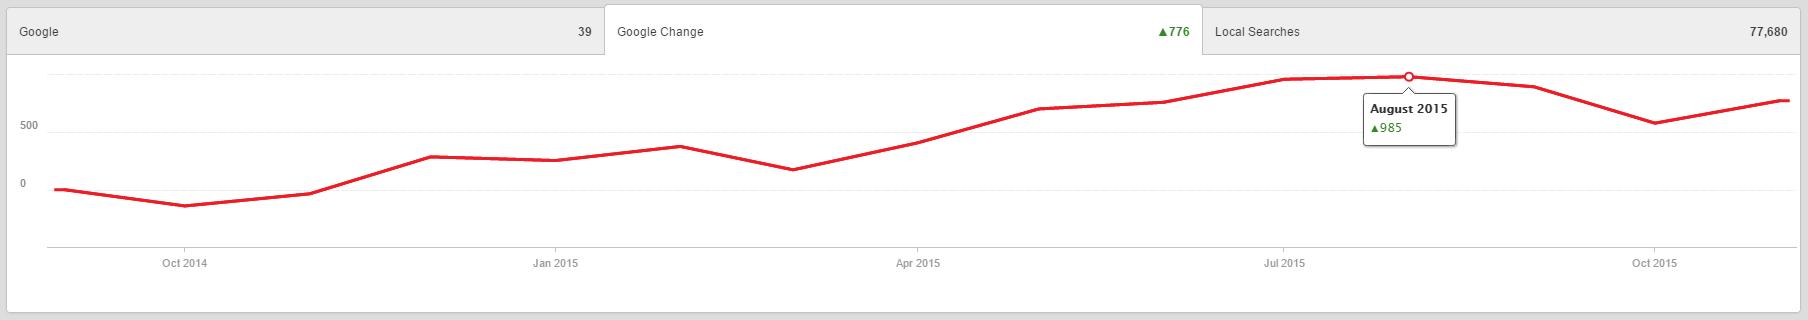 Rapid restoration keyword change graph